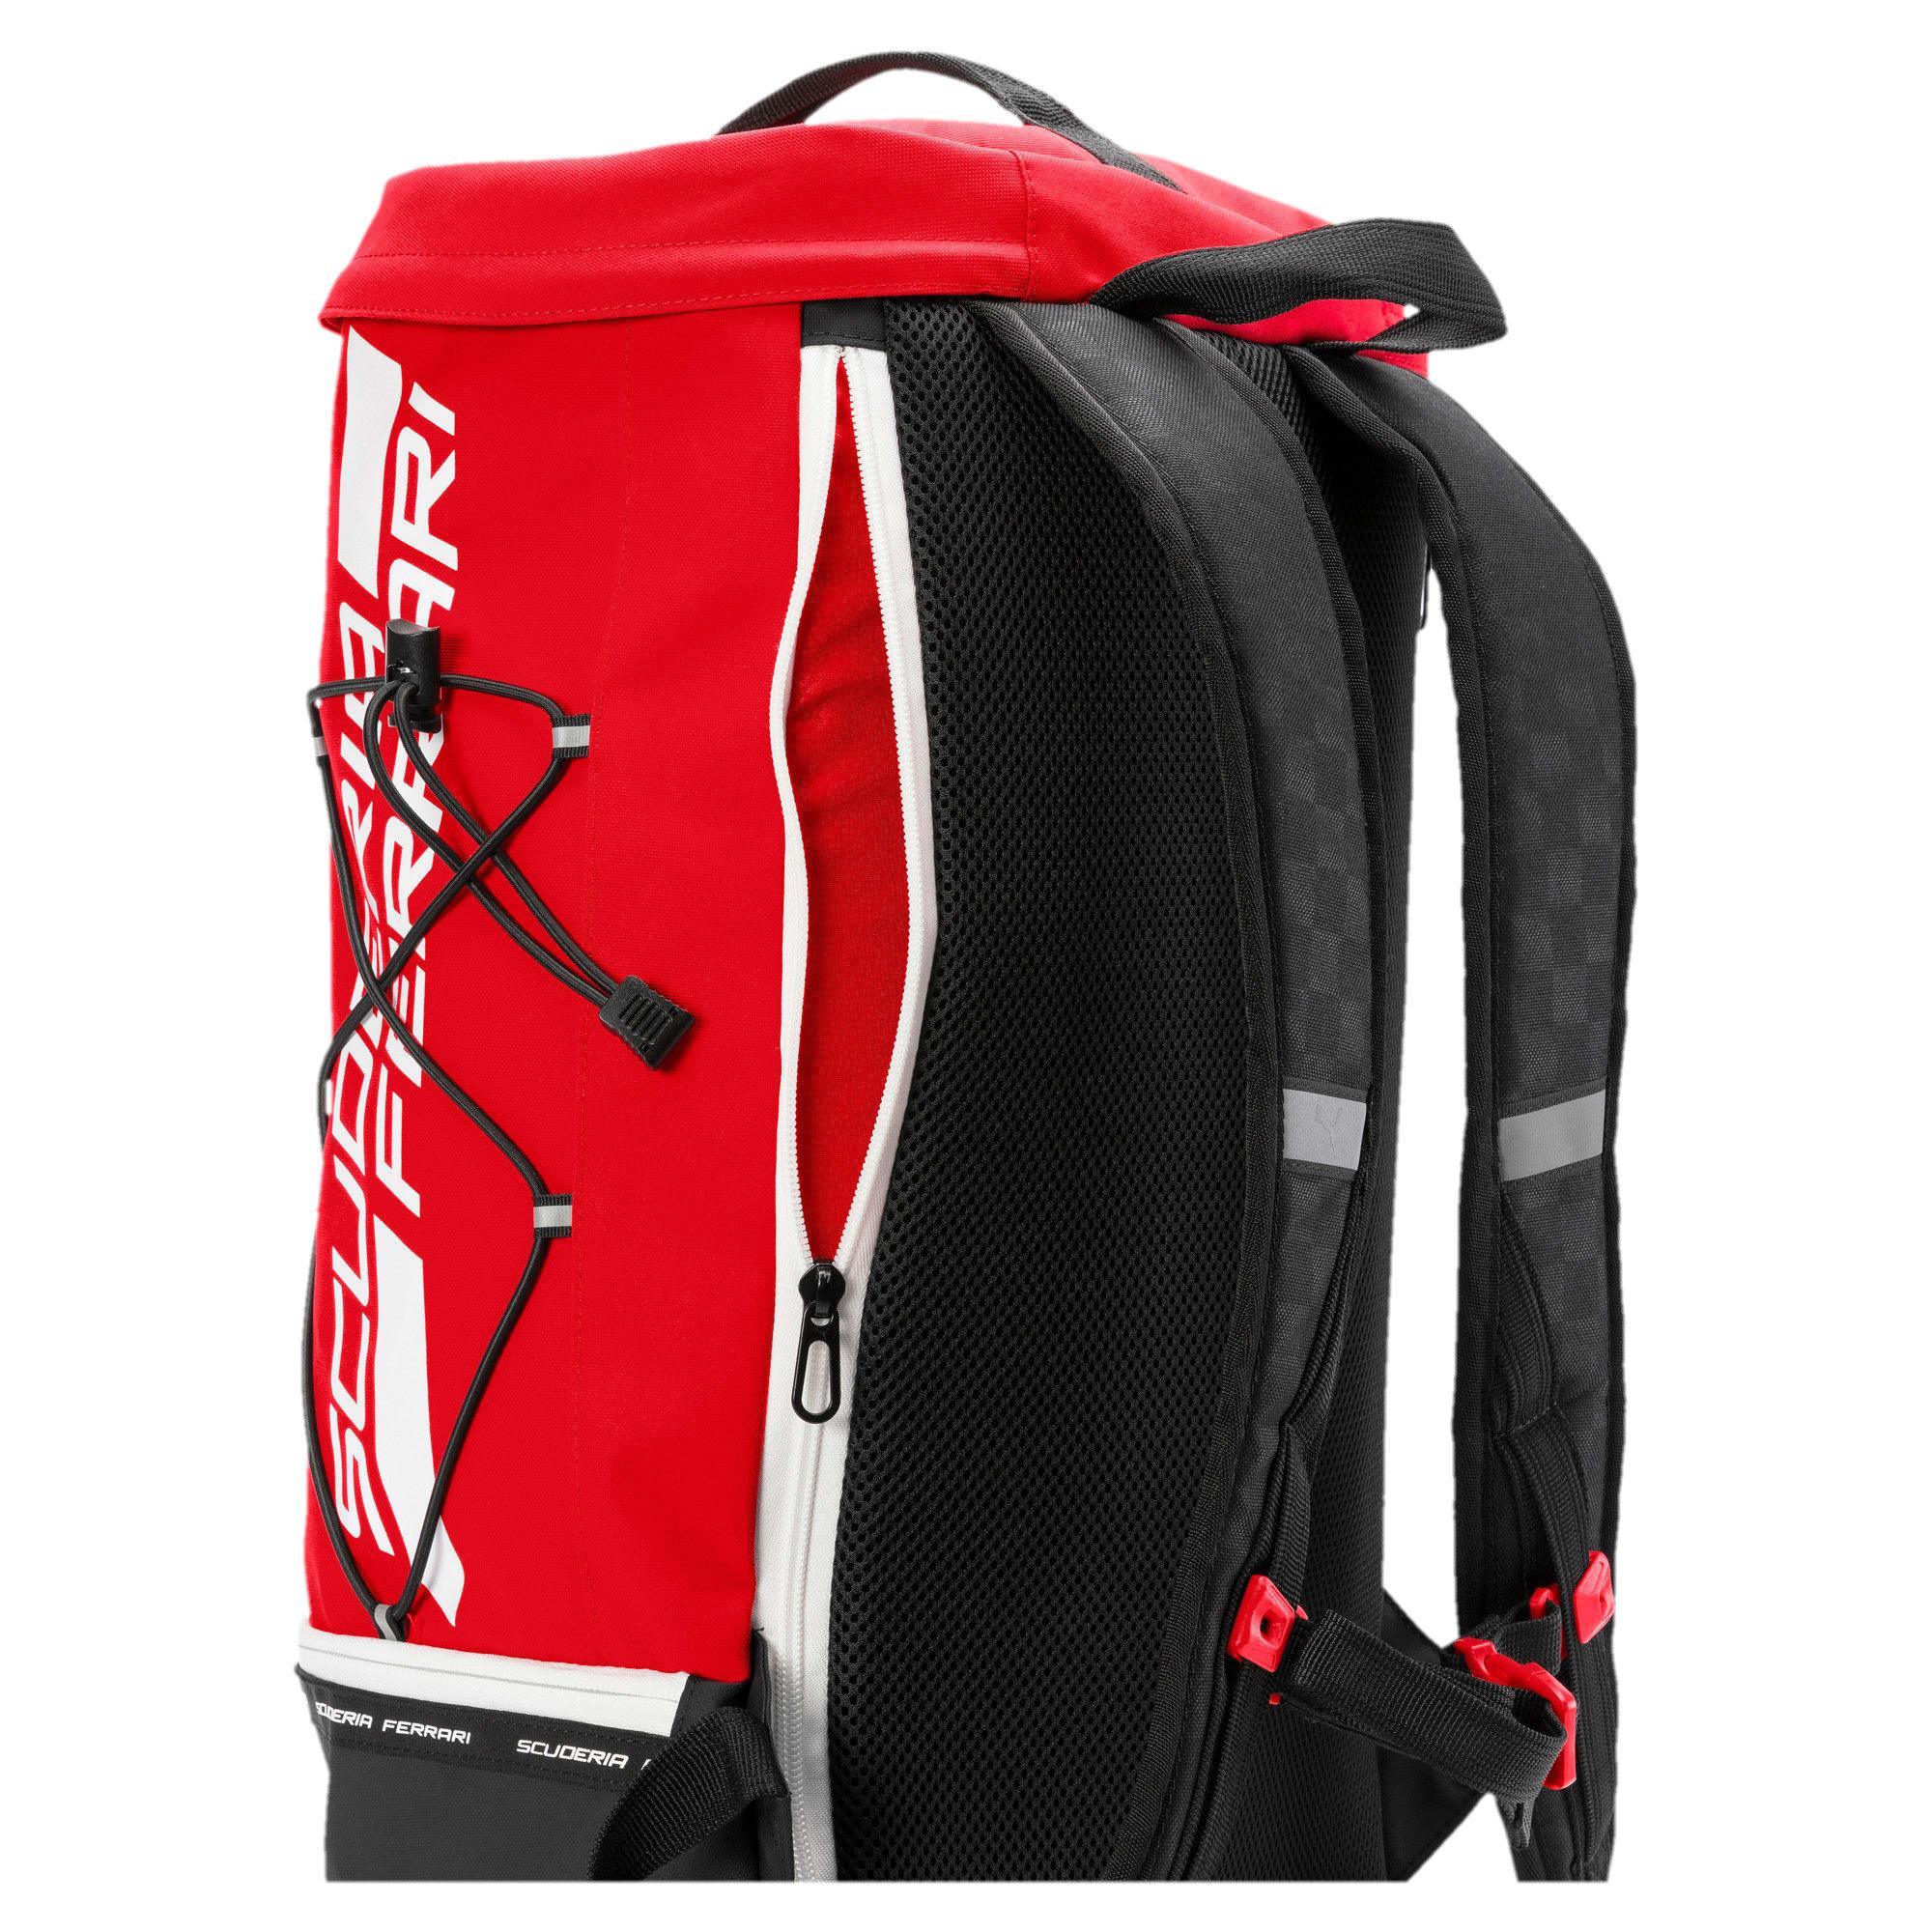 Thumbnail 6 of Ferrari Fanwear RCT Backpack, Rosso Corsa, medium